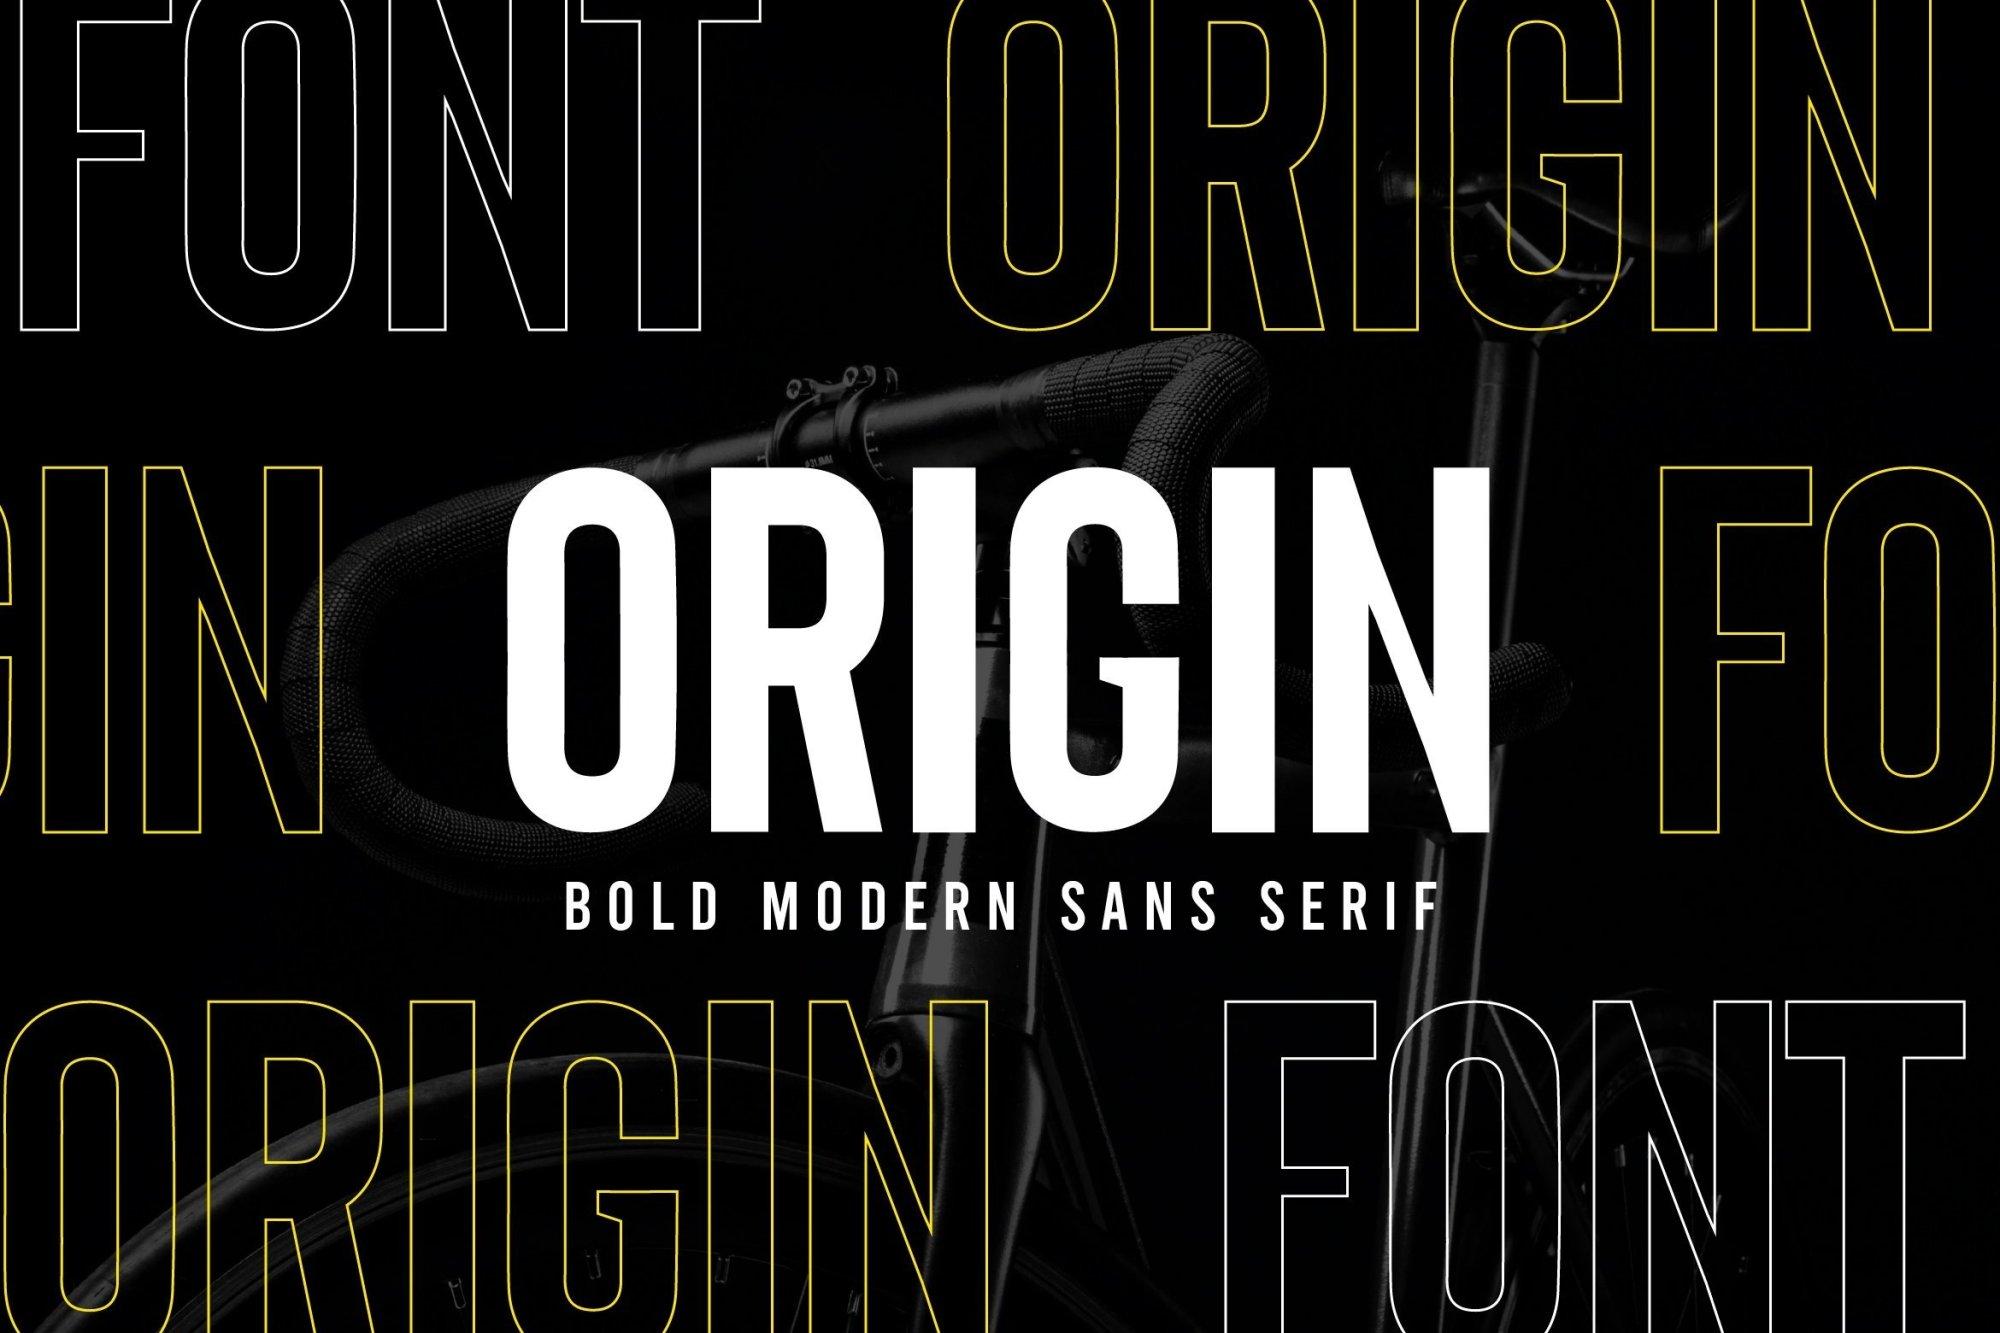 Origin-Bold-Retro-Sans-Serif-Font-1